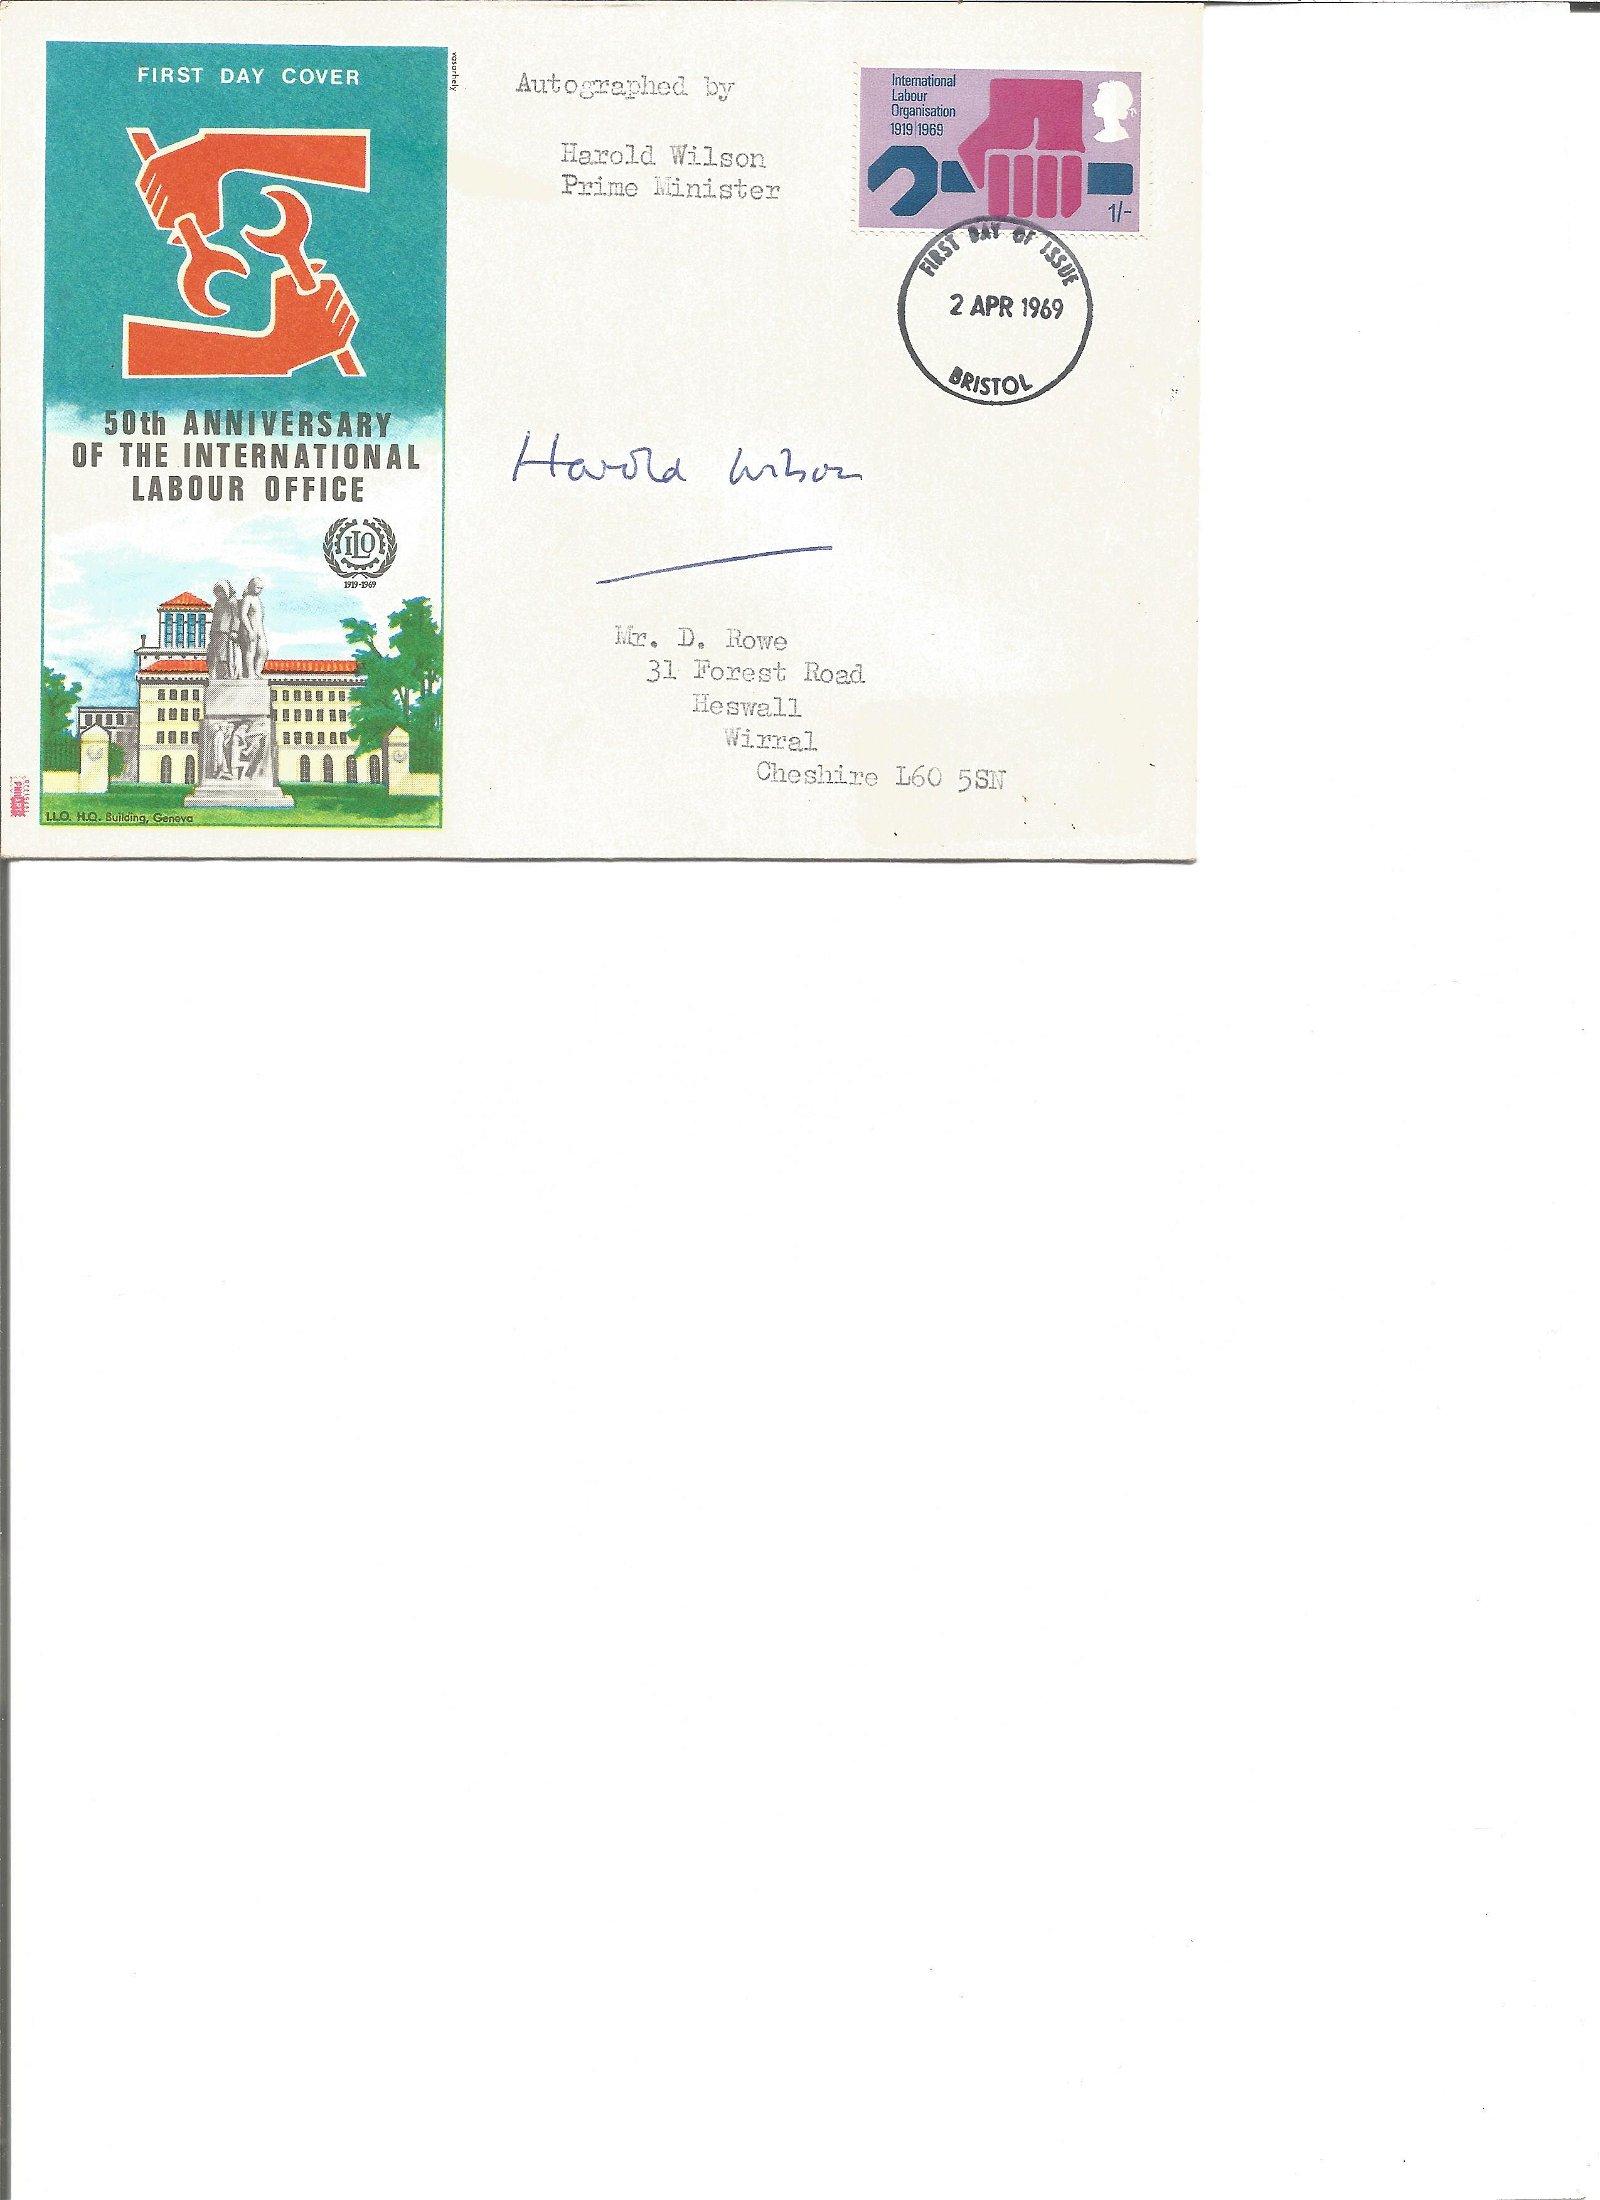 Harold Wilson signed 50th anniv of the International